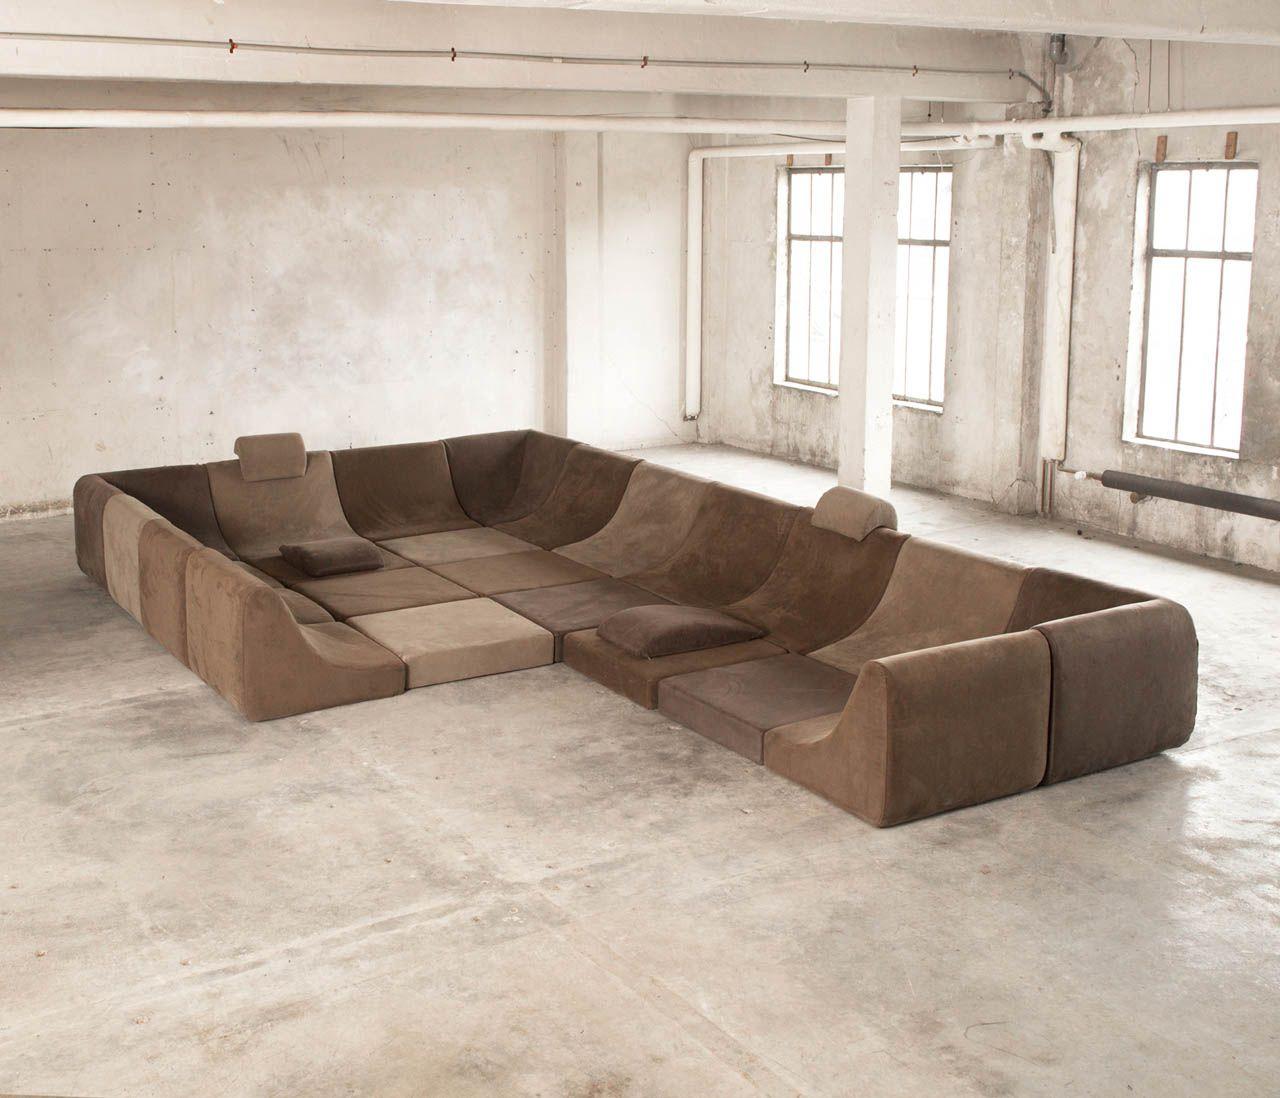 25 Pc Modular Pool Luxury Seating Landscape By Luigi Colani